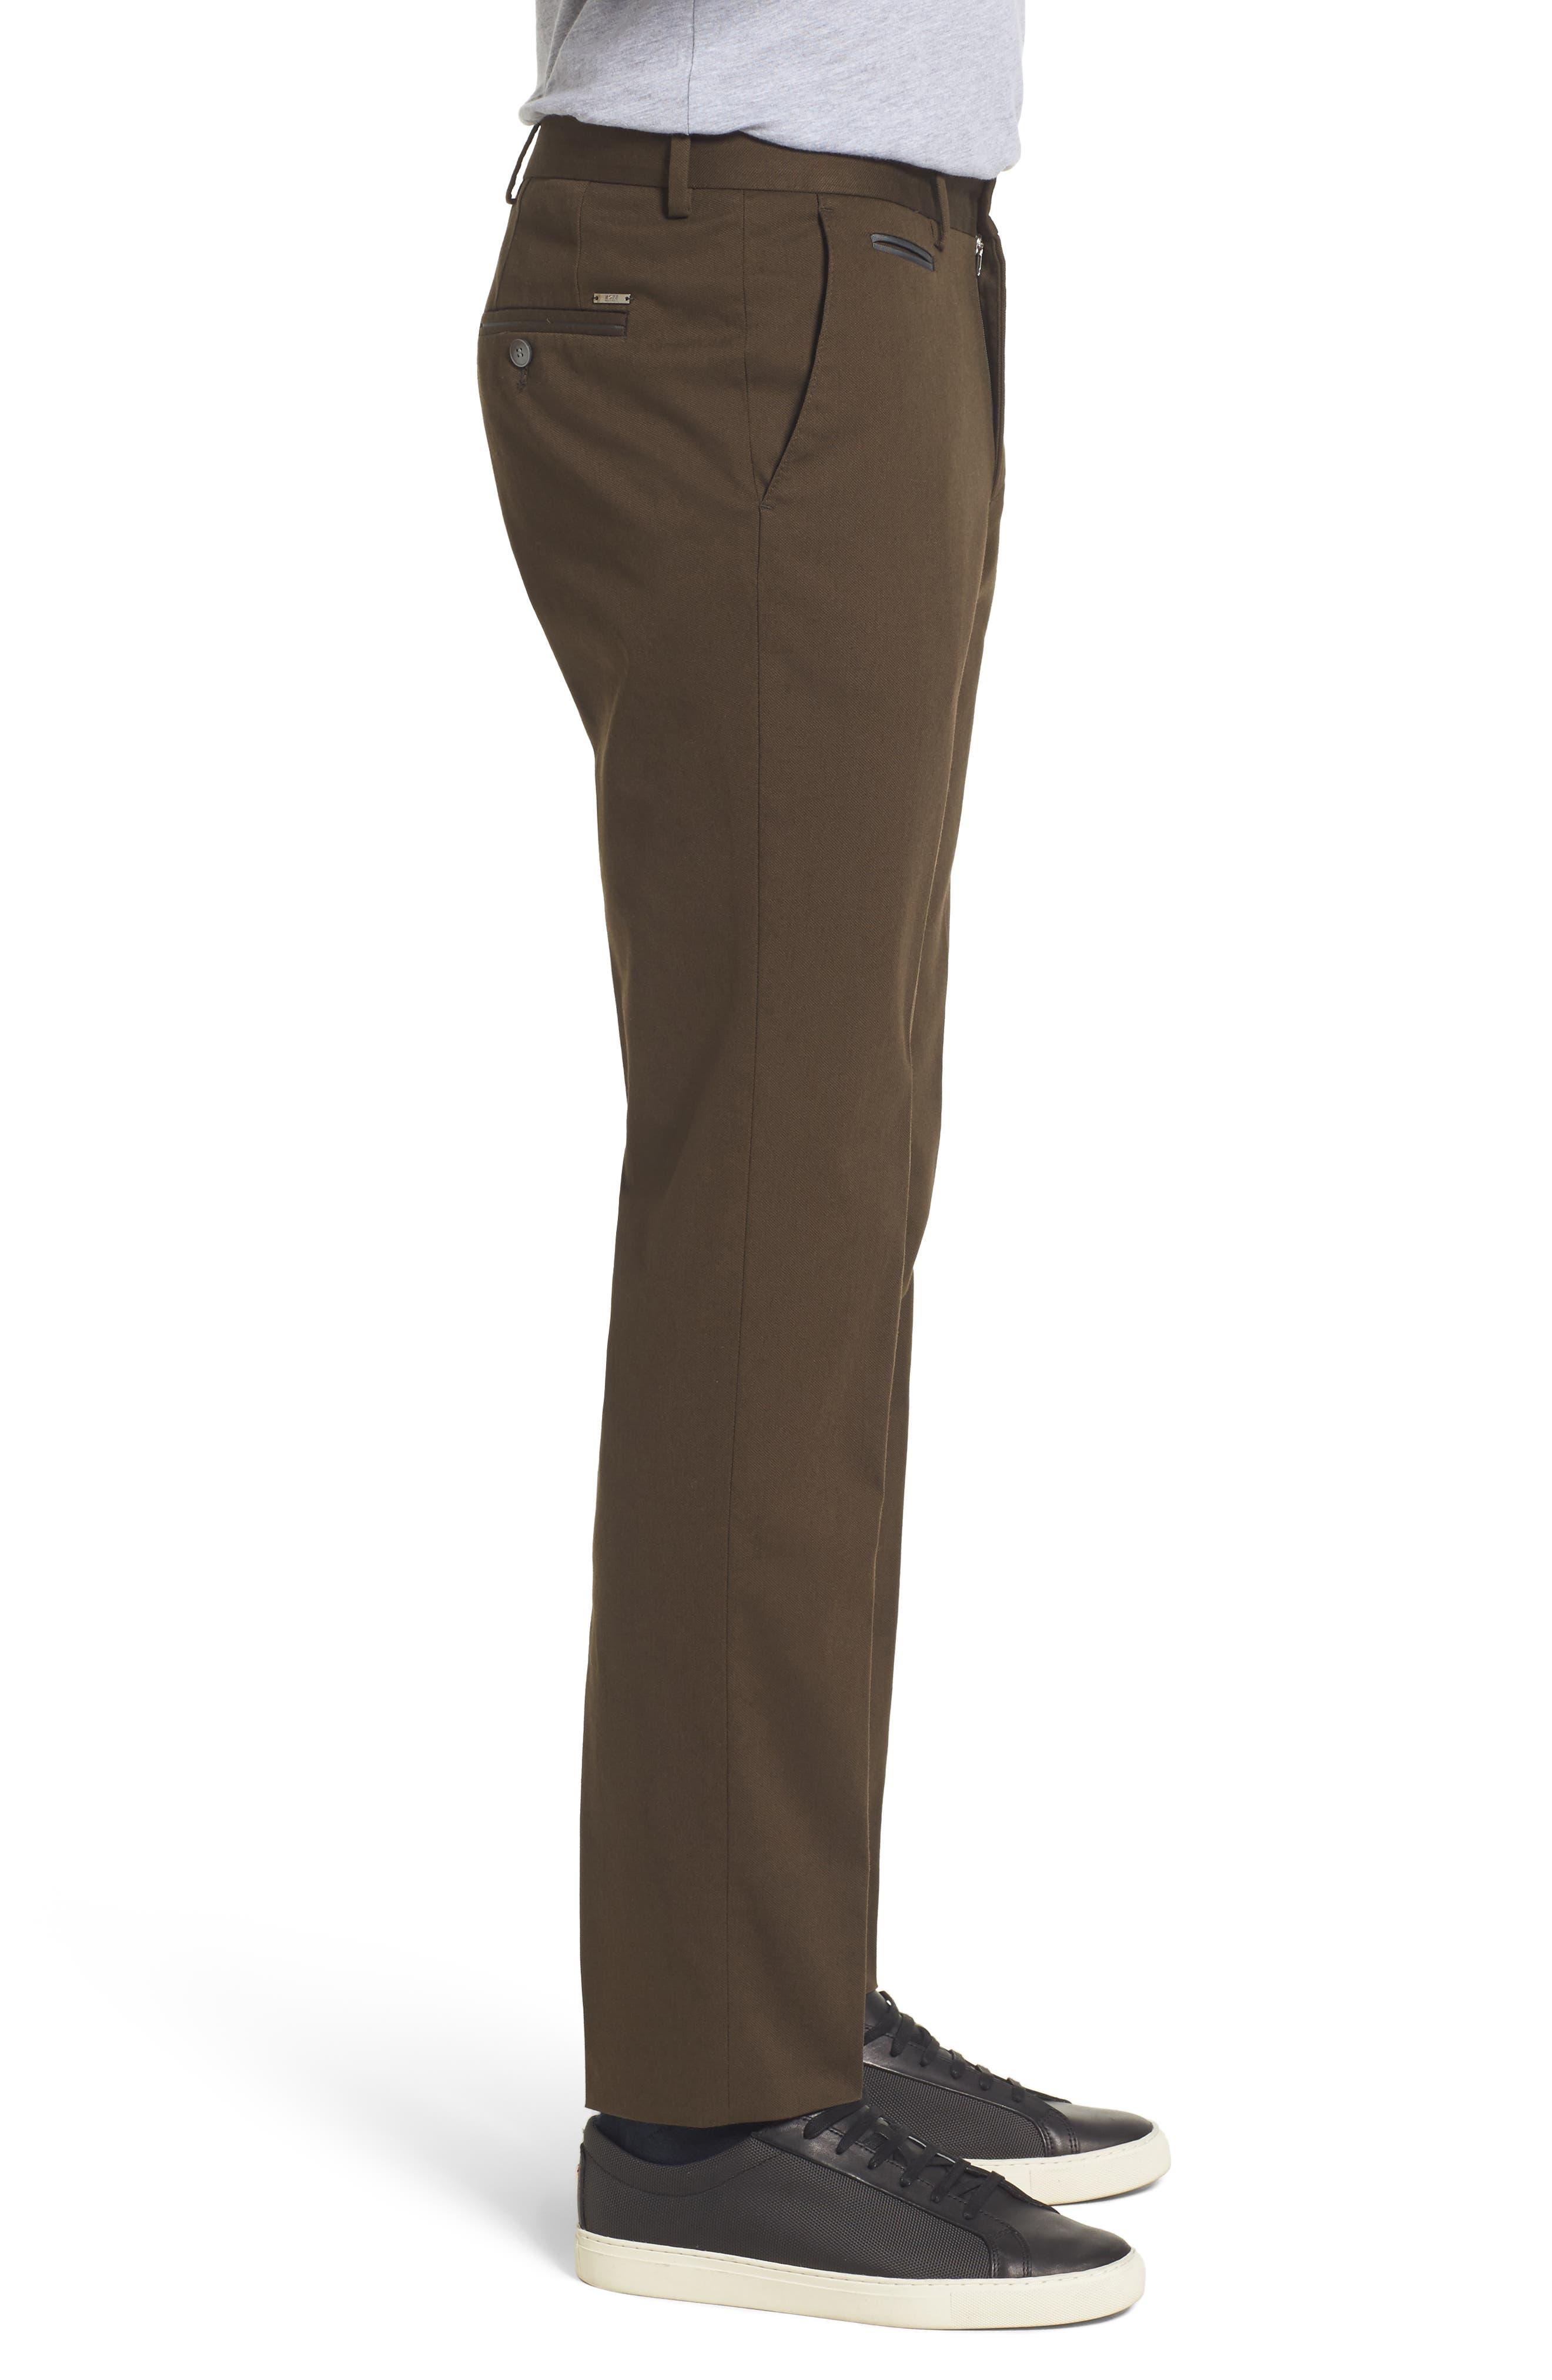 Batho-W Regular Fit Trousers,                             Alternate thumbnail 4, color,                             342